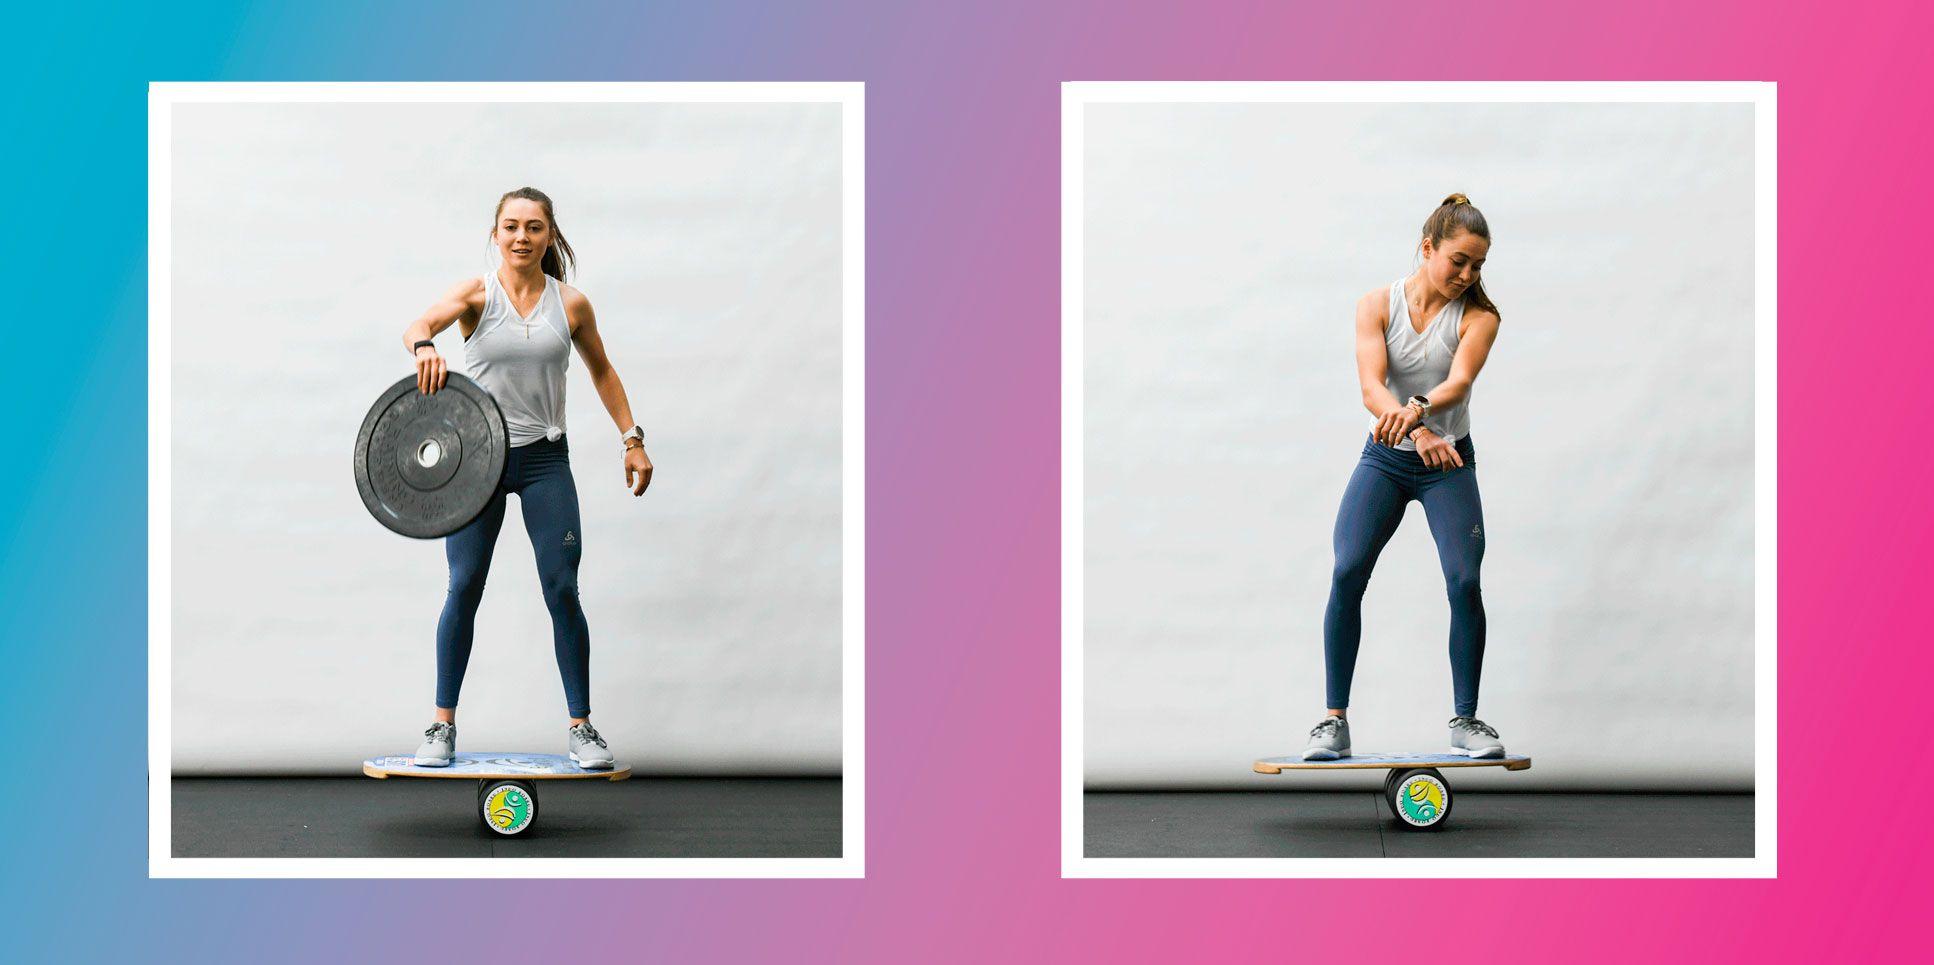 Kate Courtney Shares 11 Badass Balance Moves For Killer Core Strength